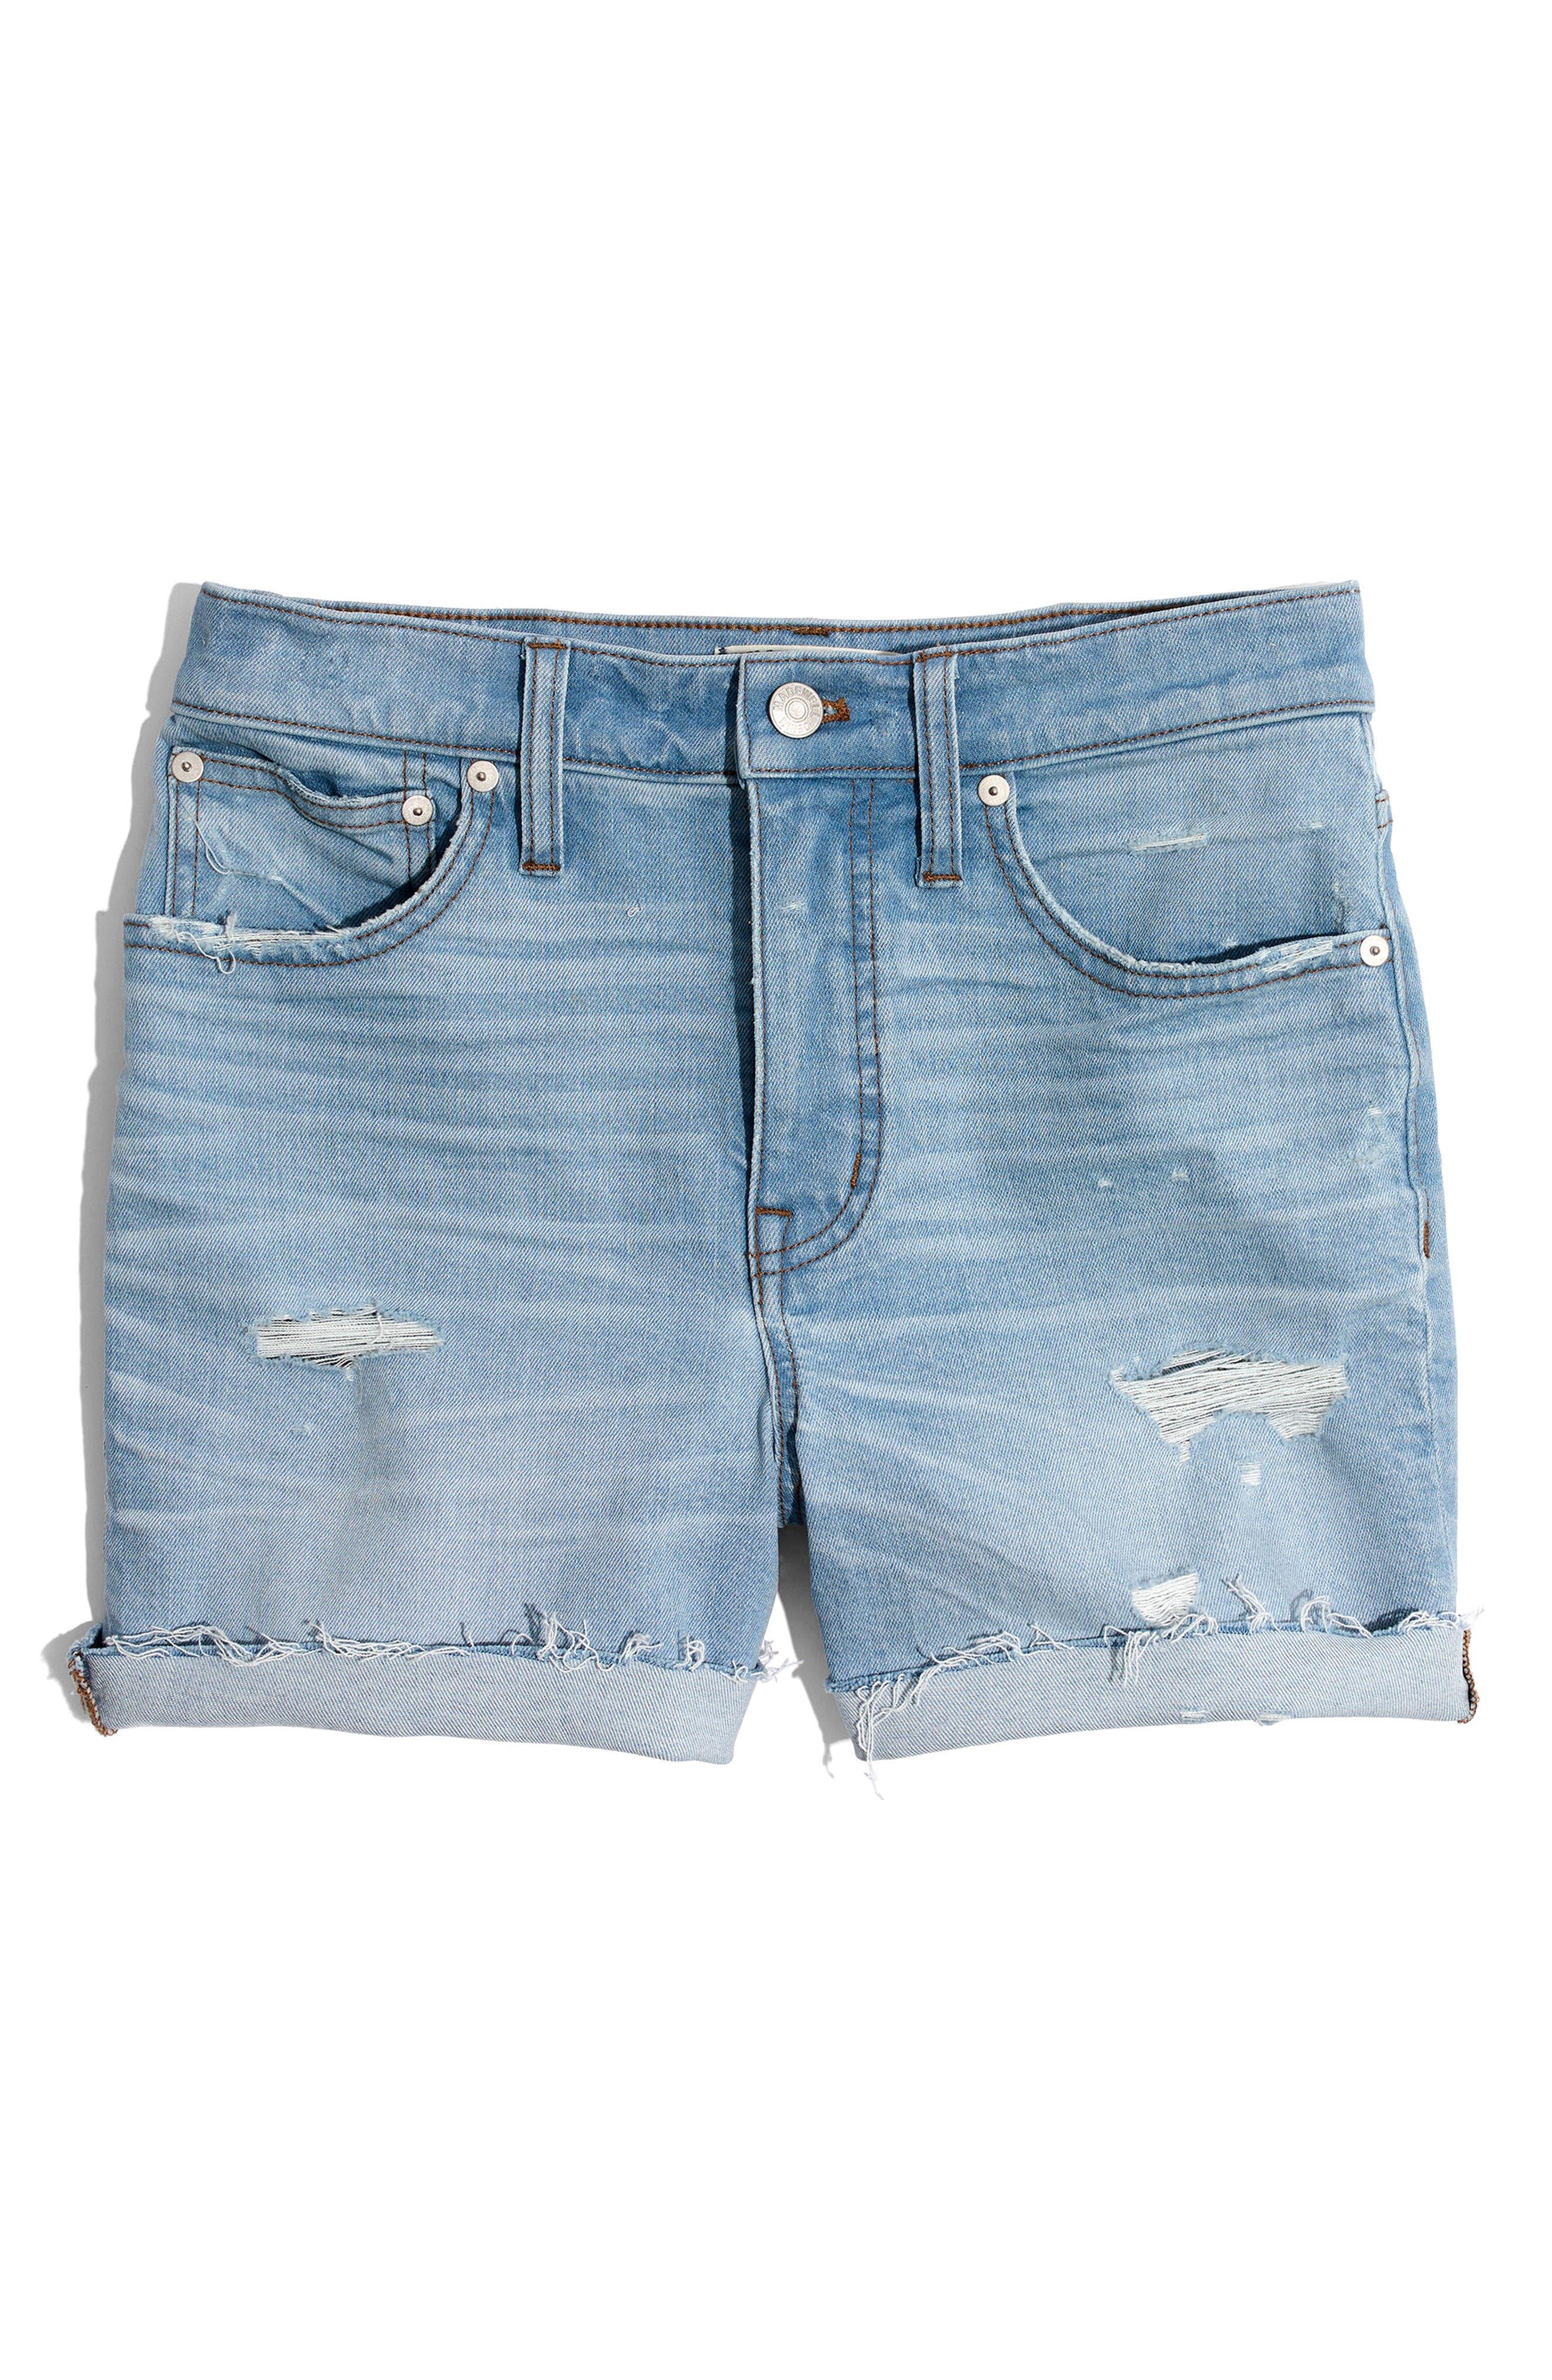 High Waist Denim Cutoff Shorts,                             Alternate thumbnail 3, color,                             400